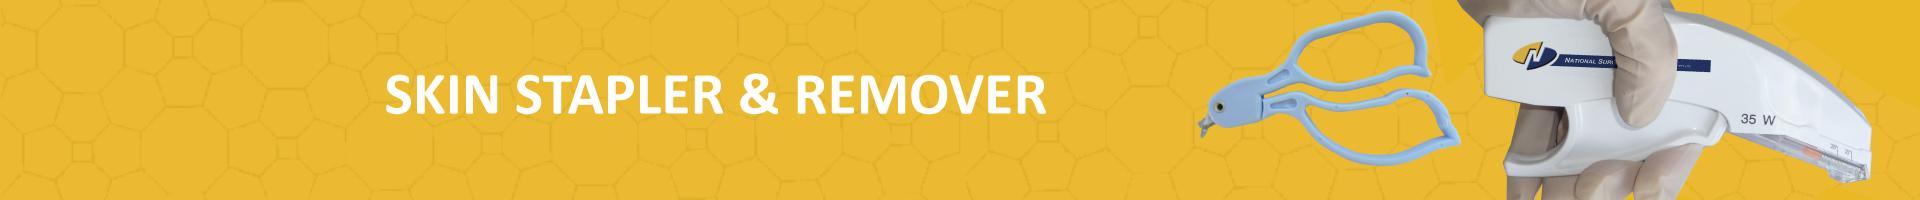 Skin stapler and remover